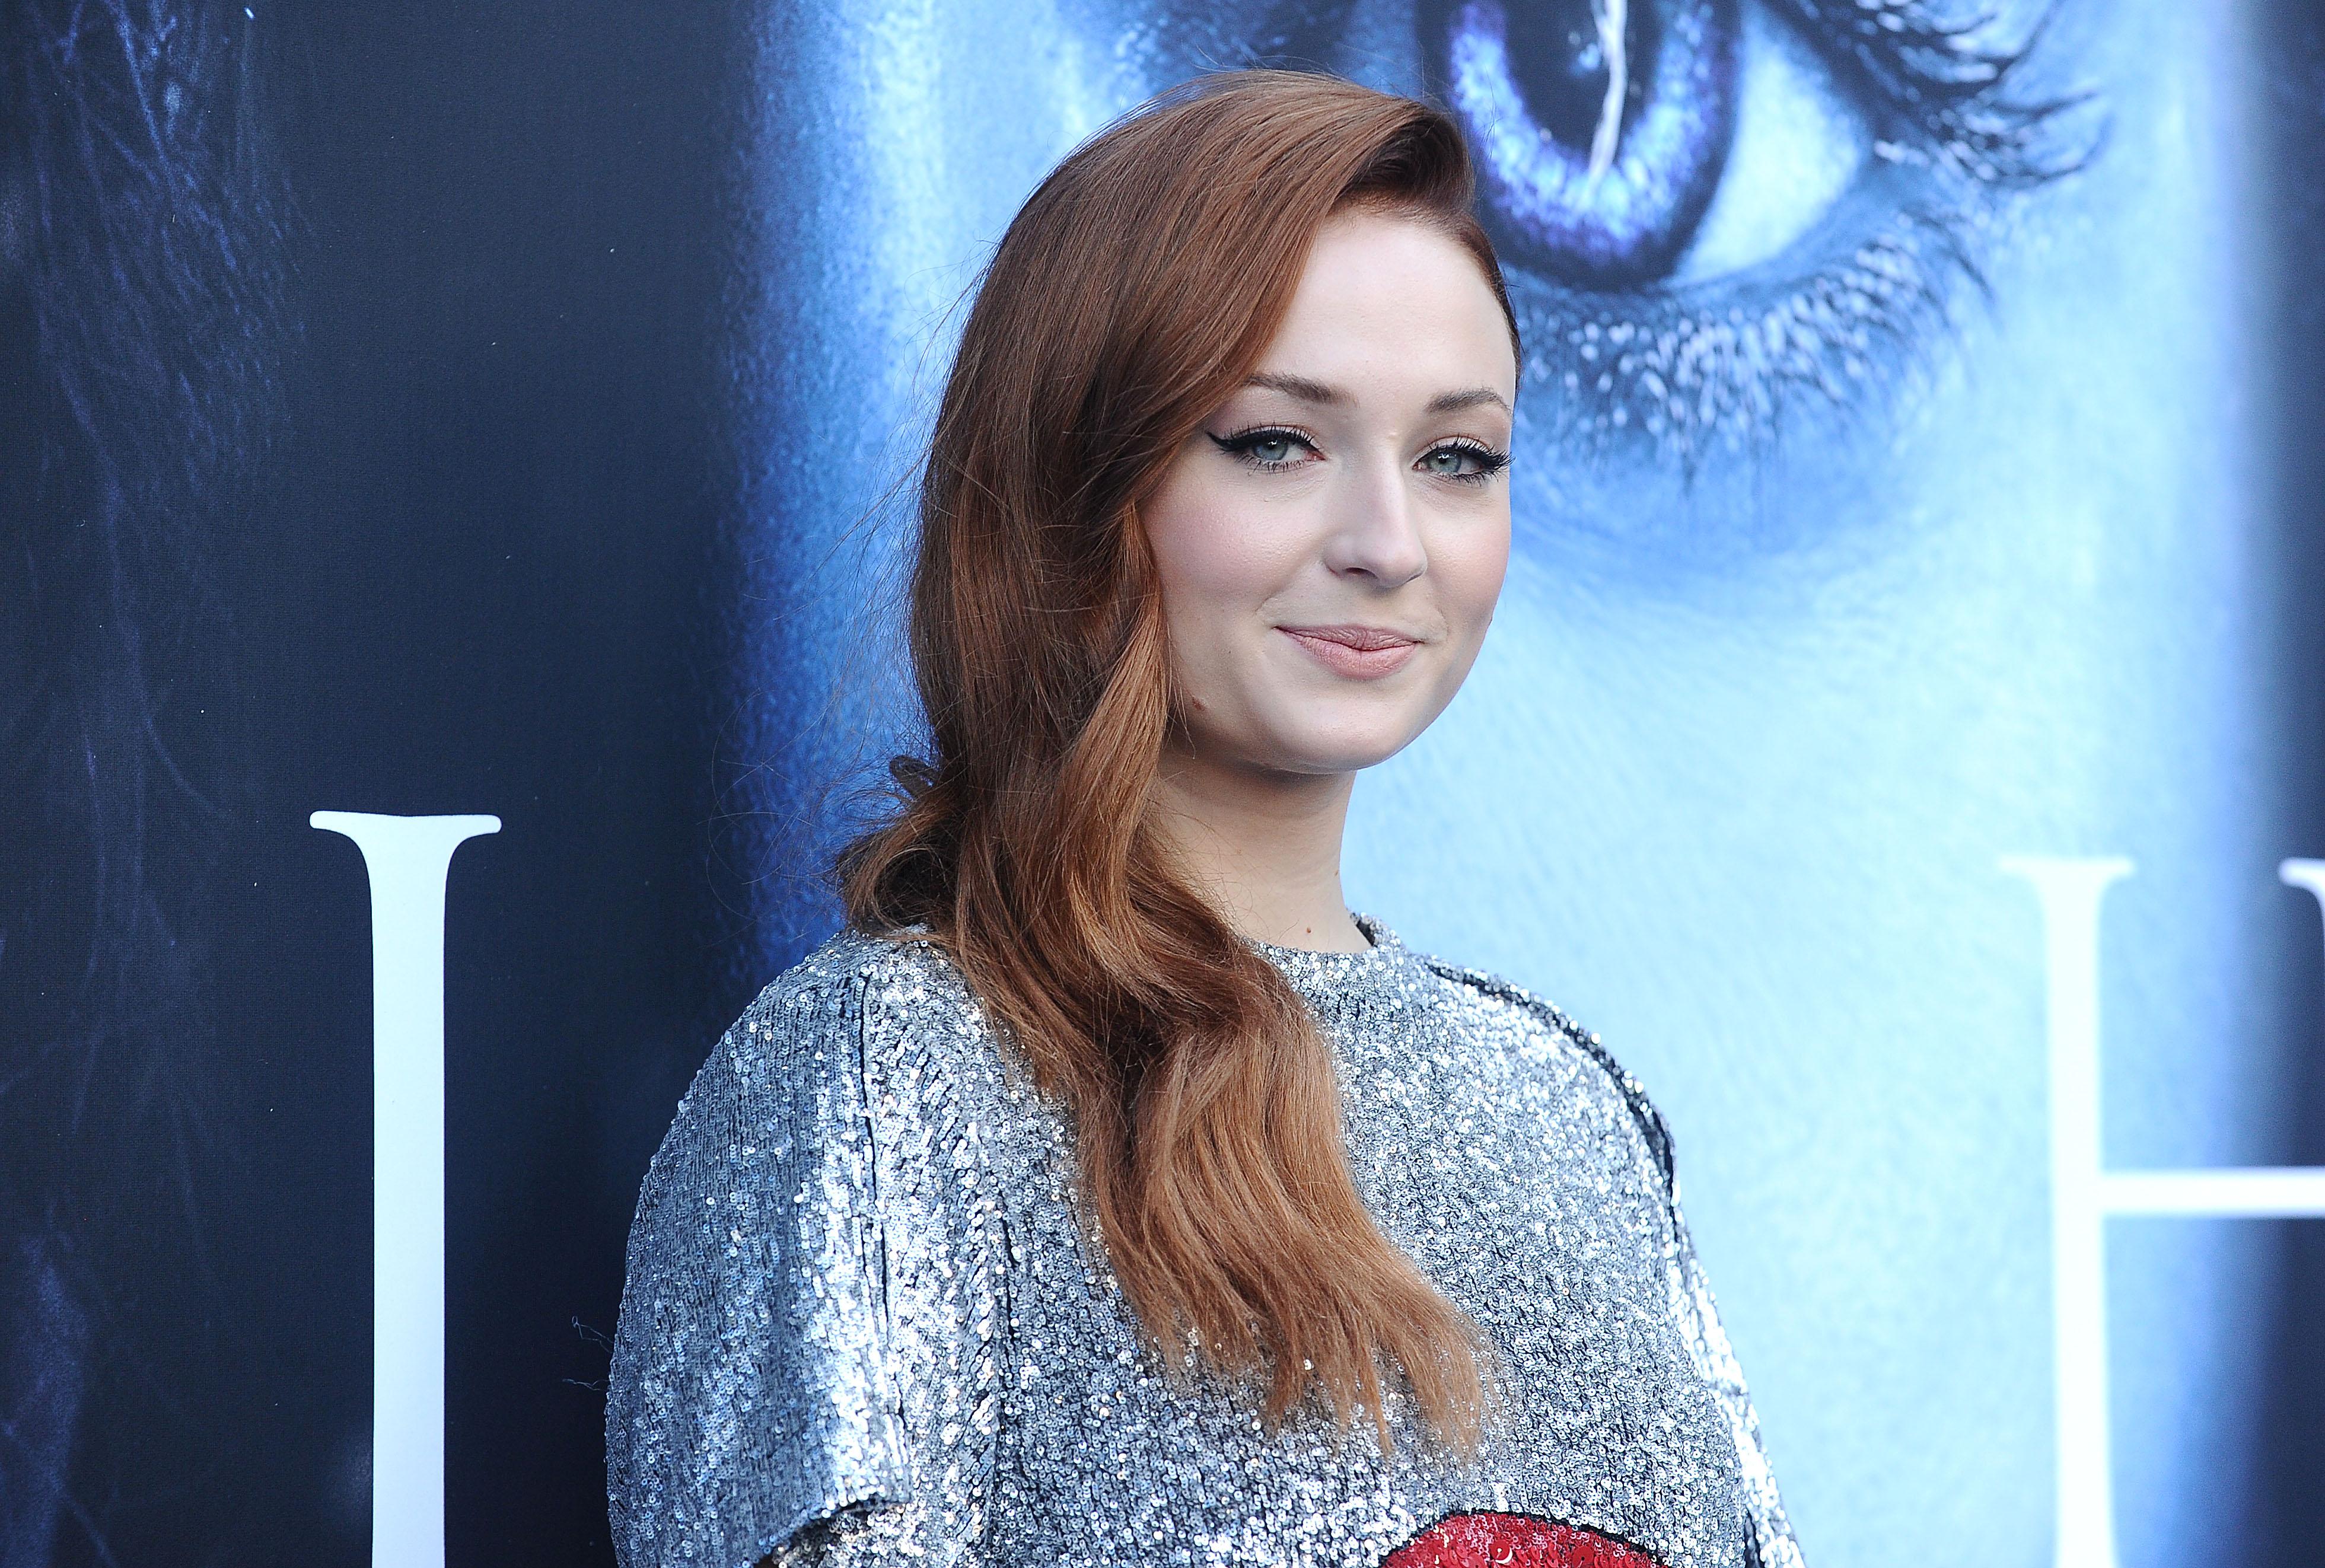 Sophie Turner at Game of Thrones premiere